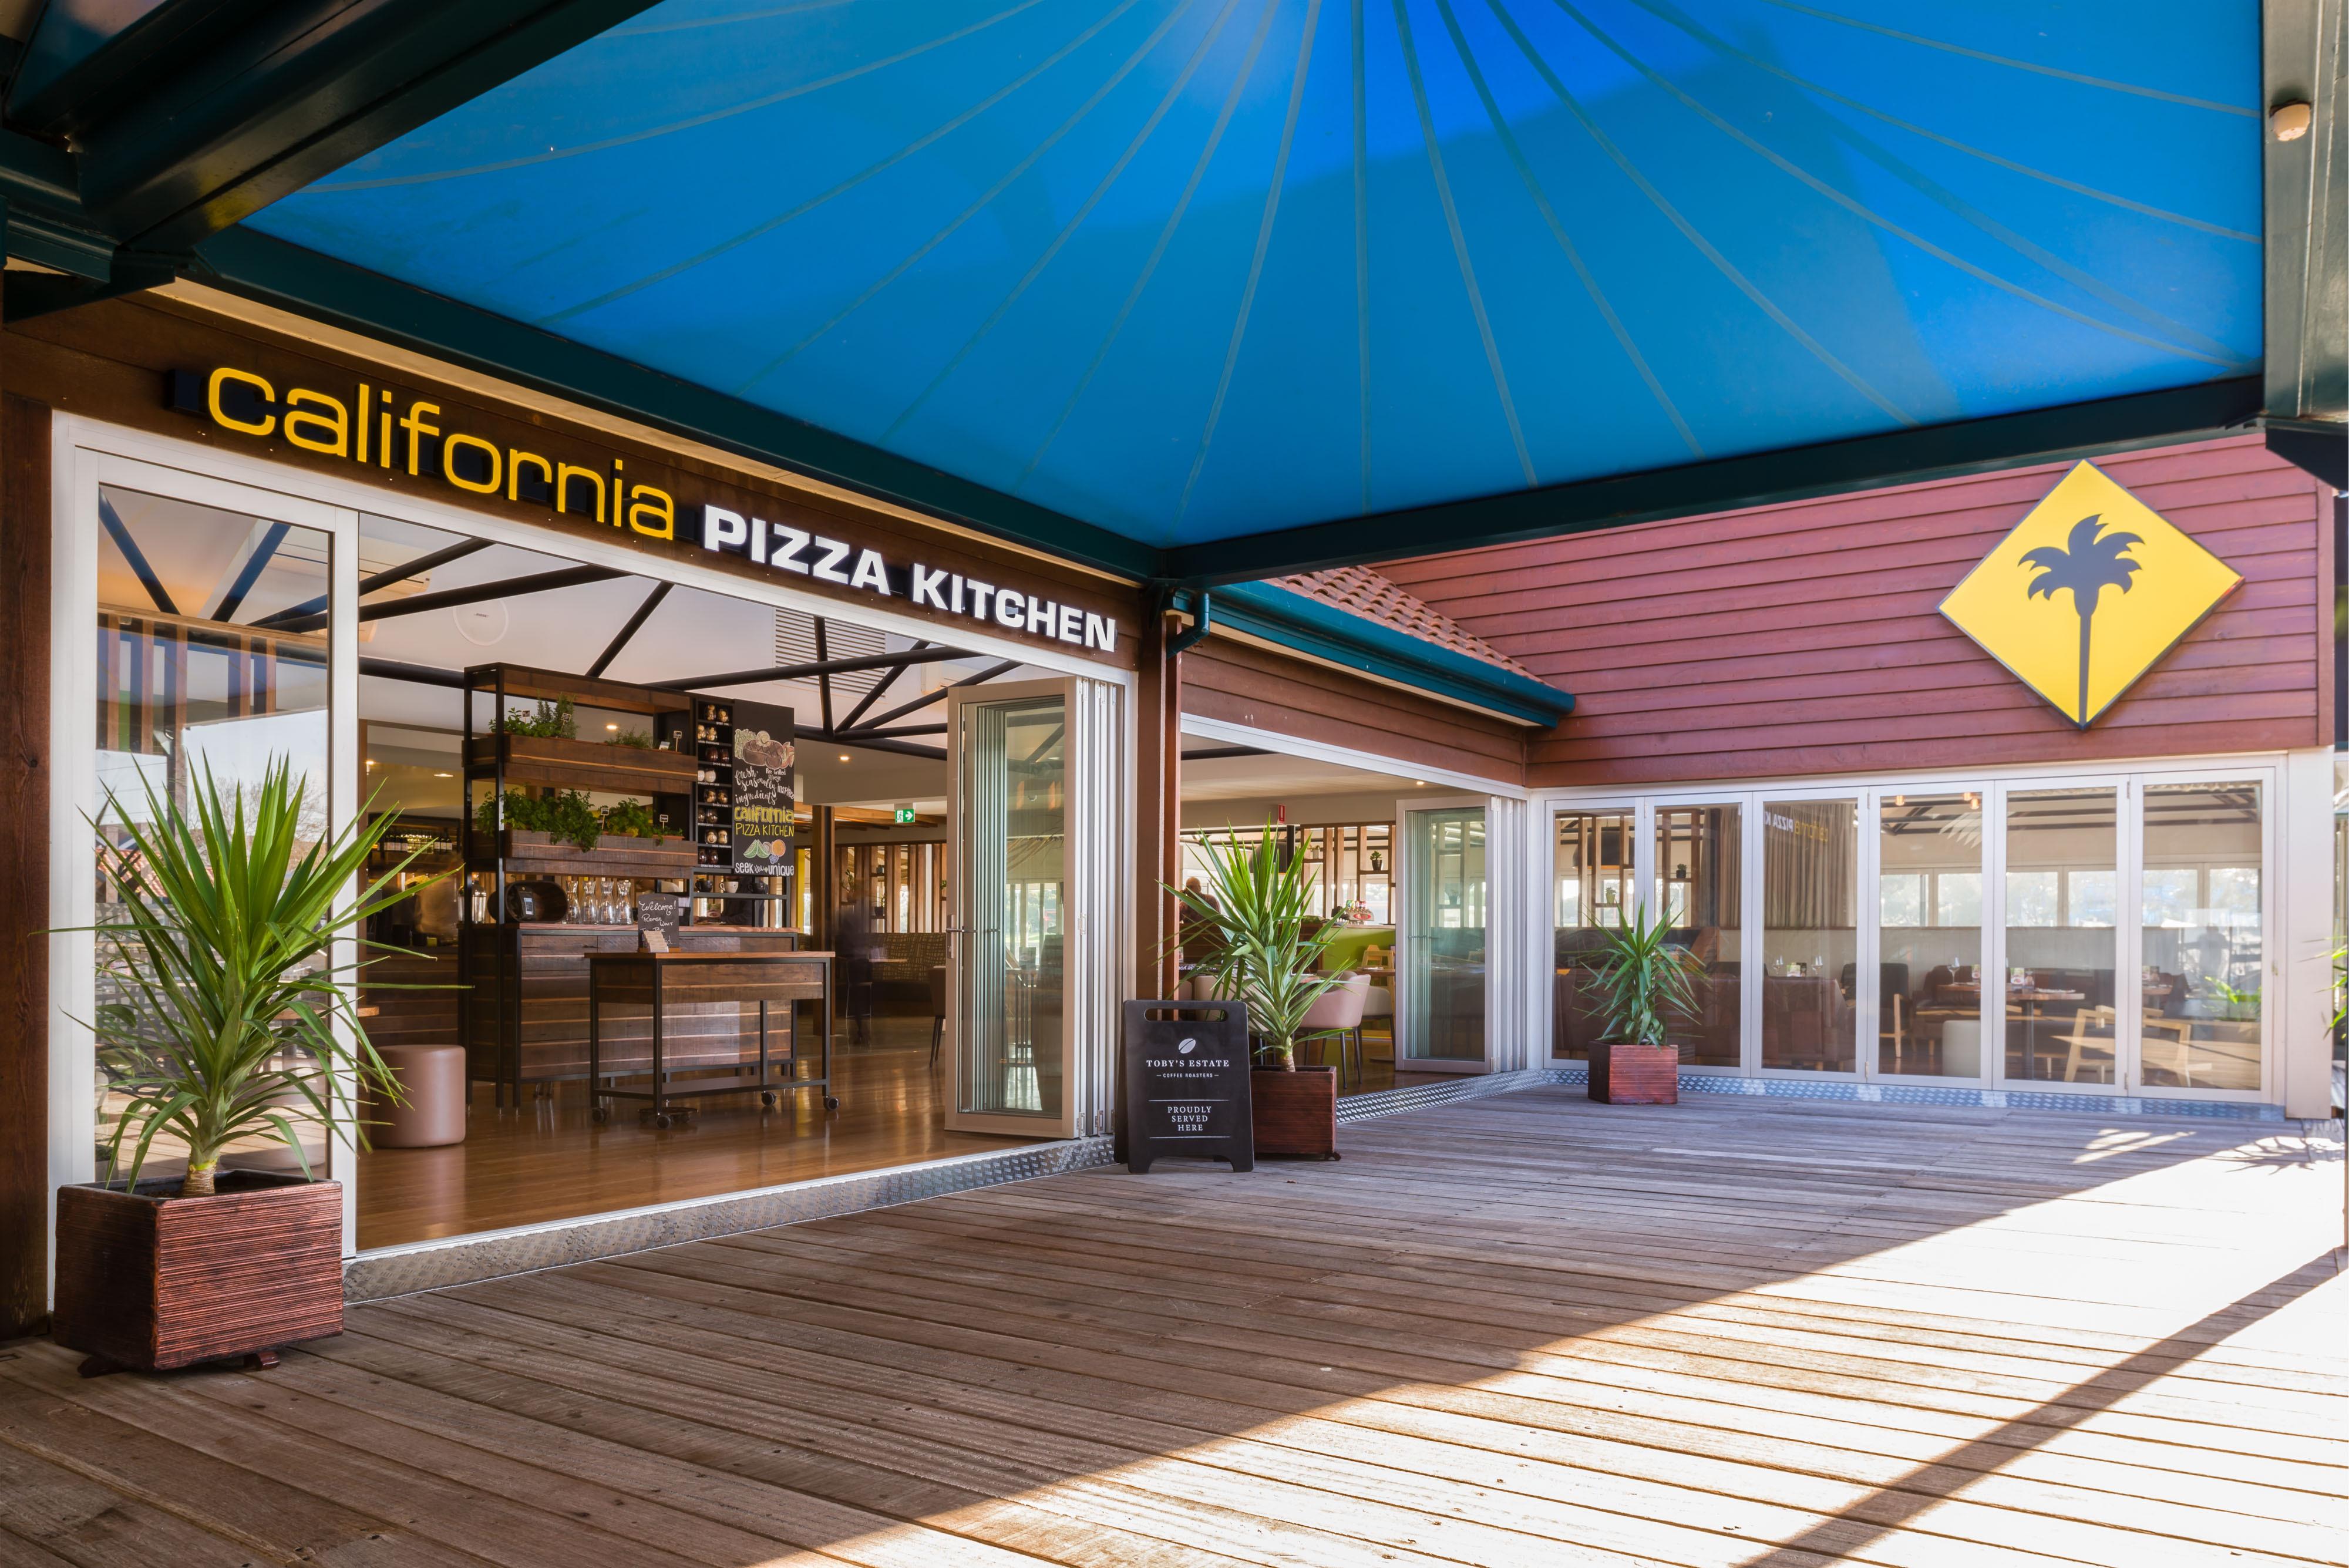 california pizza kitchen opens first location in australia rh businesswire com  california pizza kitchen franchise cost in india